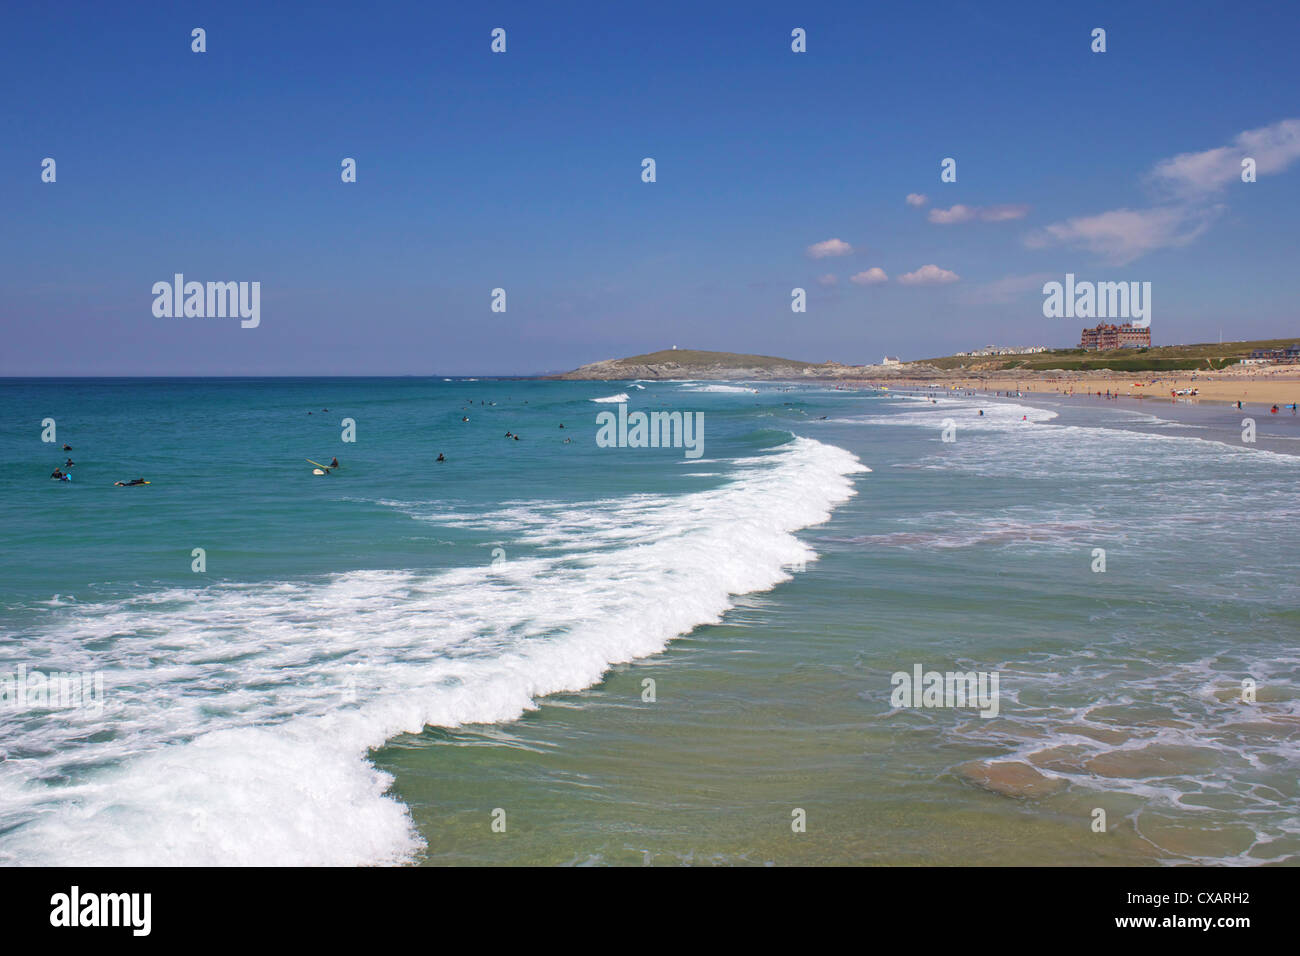 Fistral Beach, Newquay, Cornwall, England, United Kingdom, Europe - Stock Image